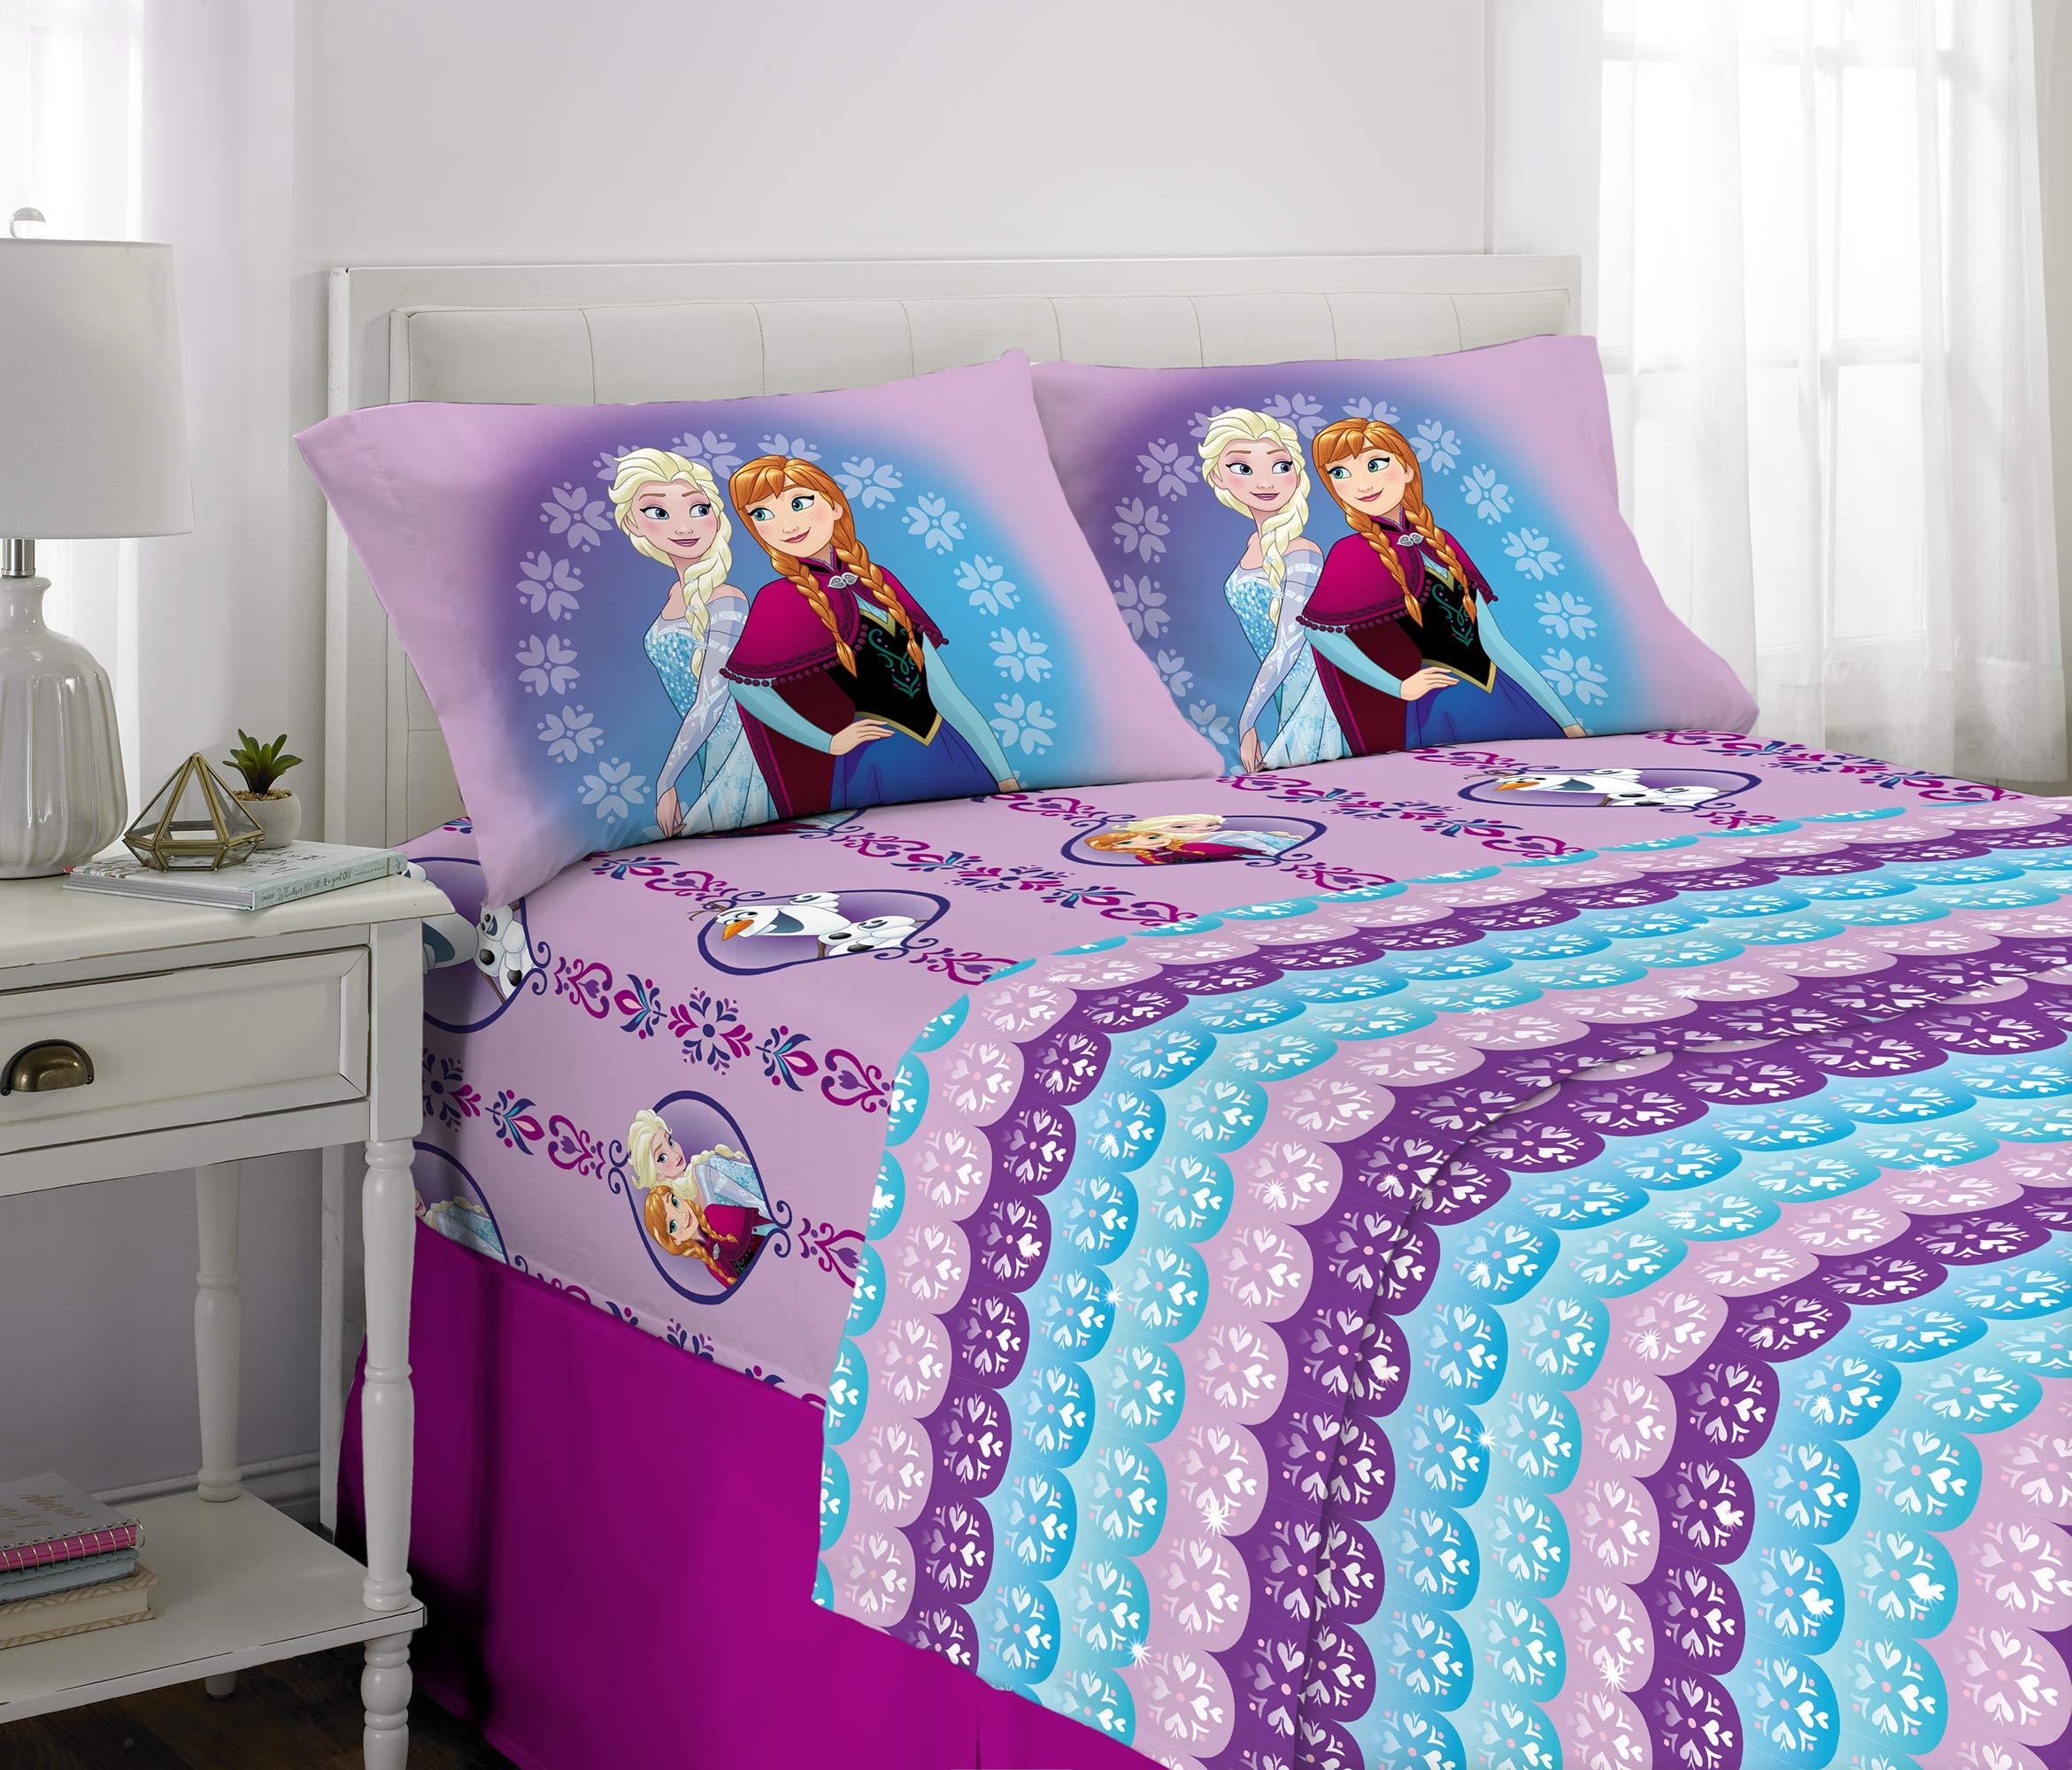 Disney Frozen Kids Bedding Soft Microfiber Sheet Set, Full Size 4 Piece Pack by Disney